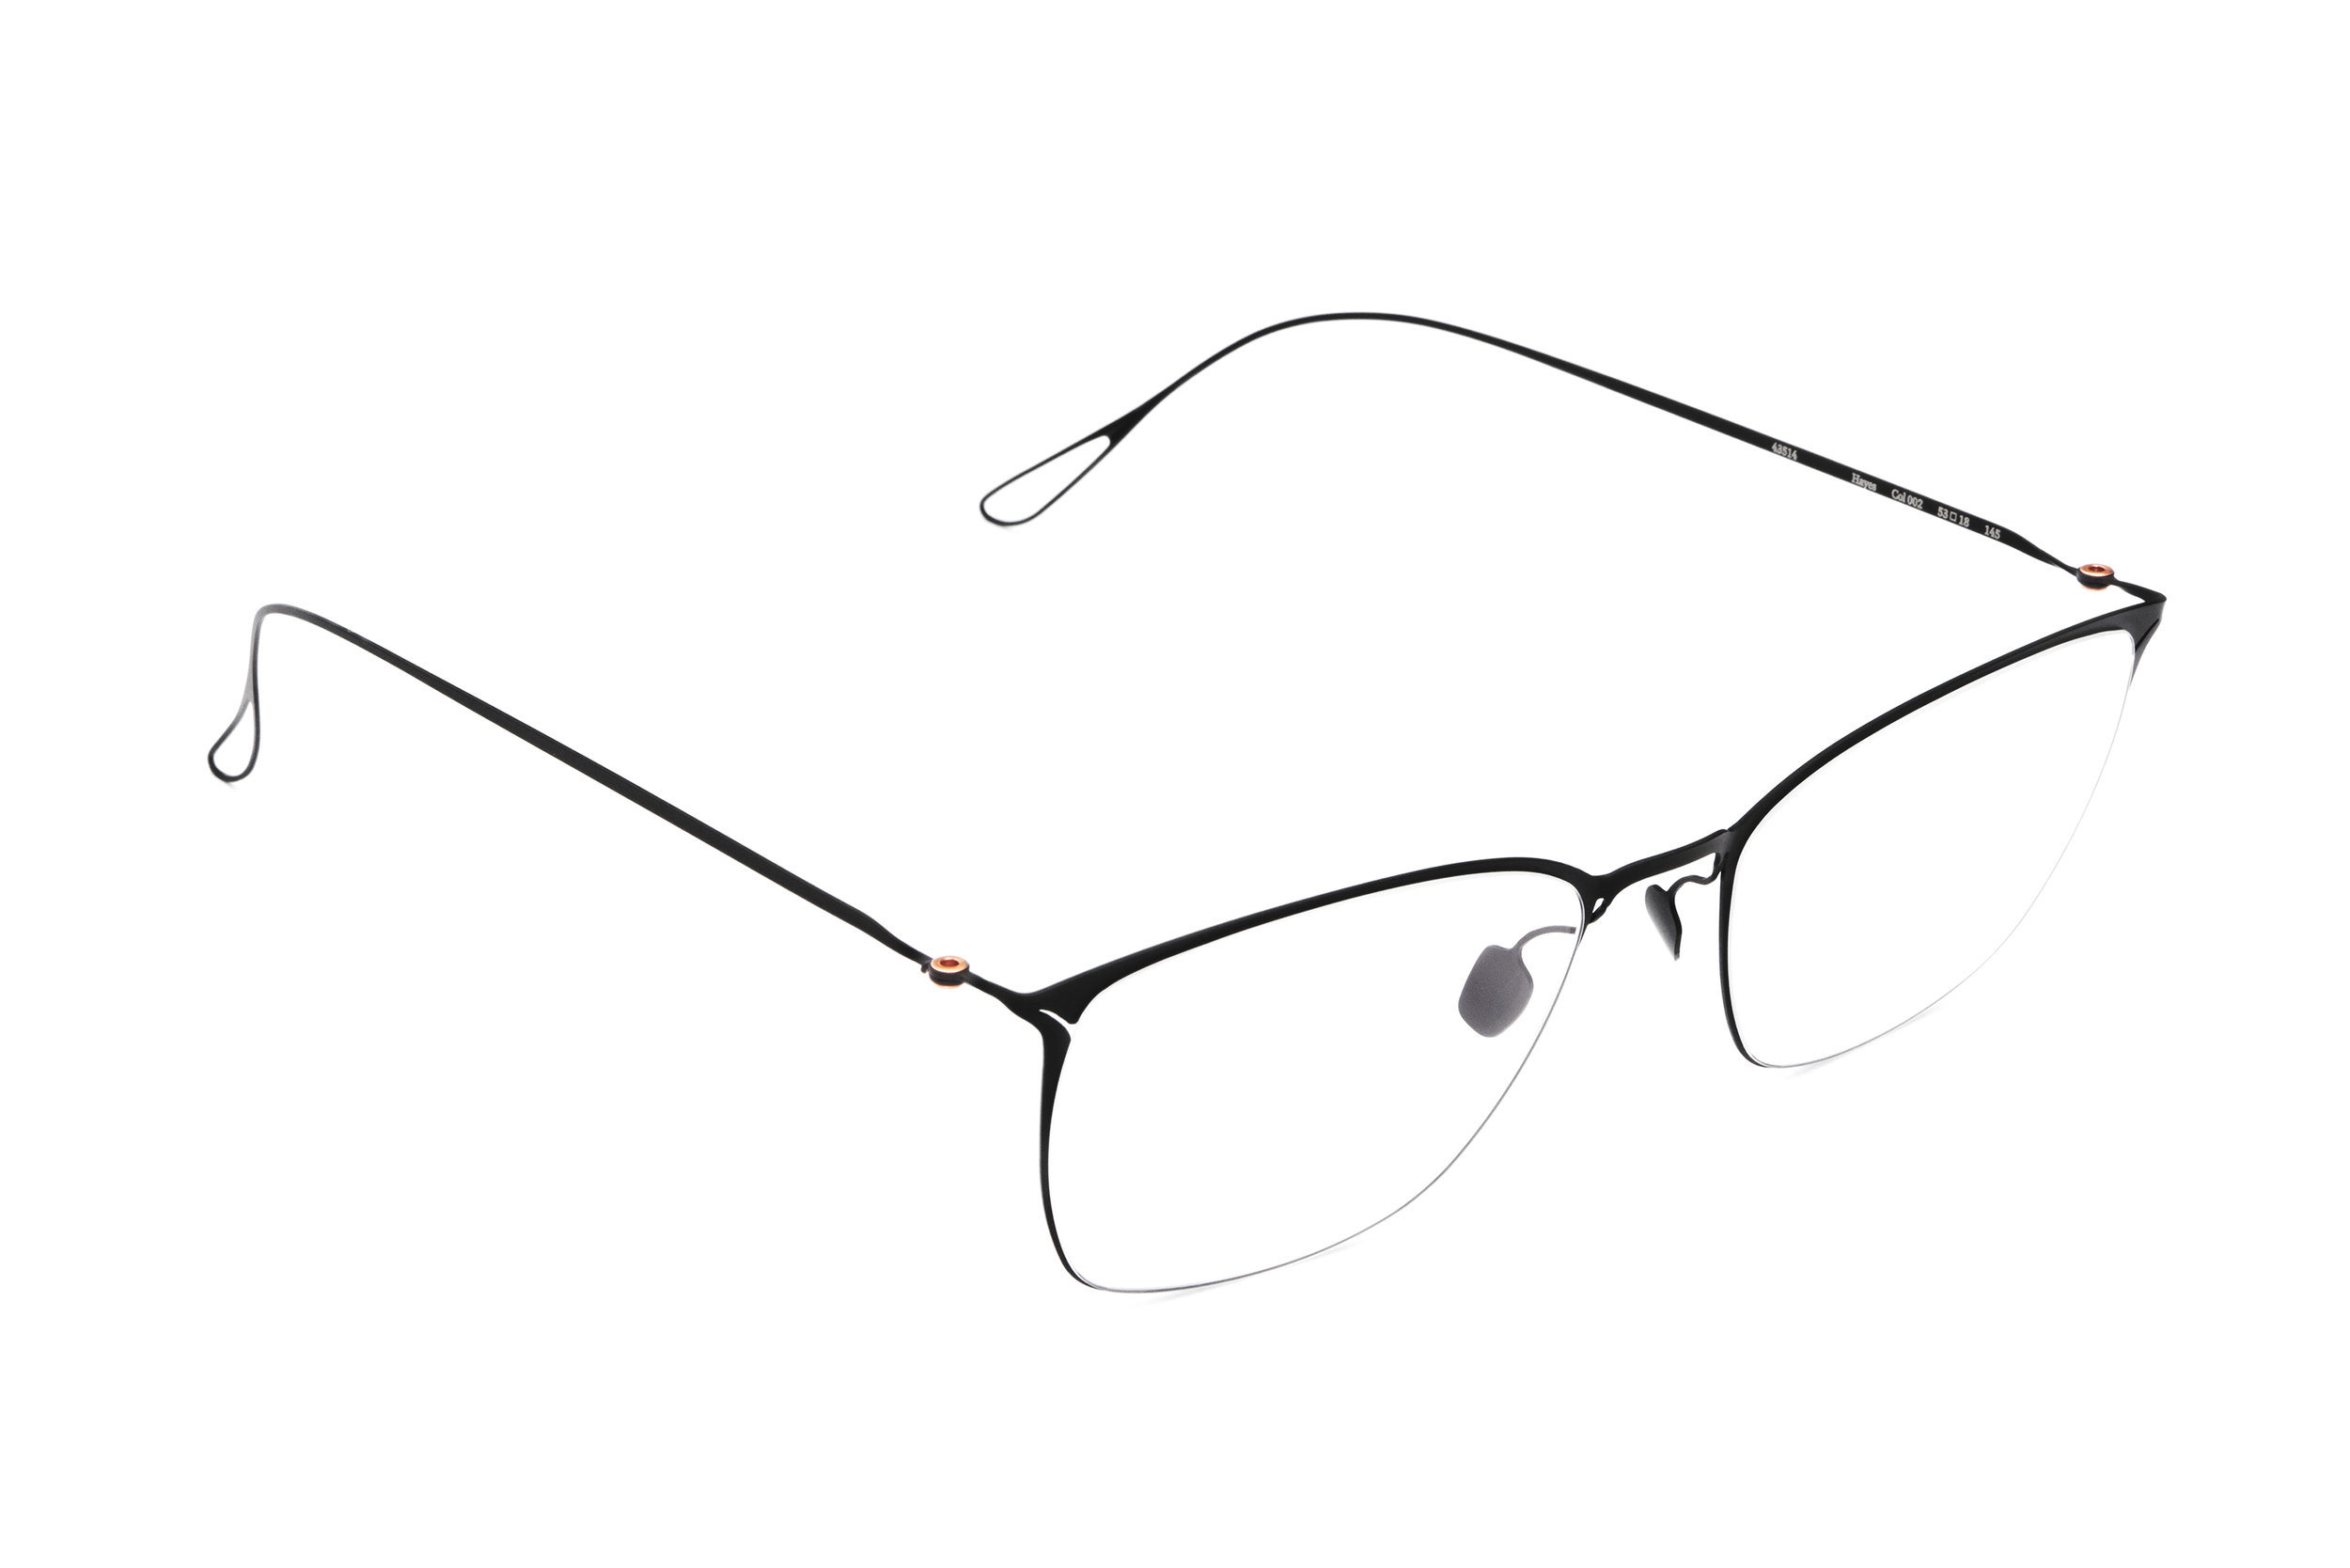 haffmans_neumeister_hayes_black_clear_ultralight_eyeglasses_angle_102453.jpg